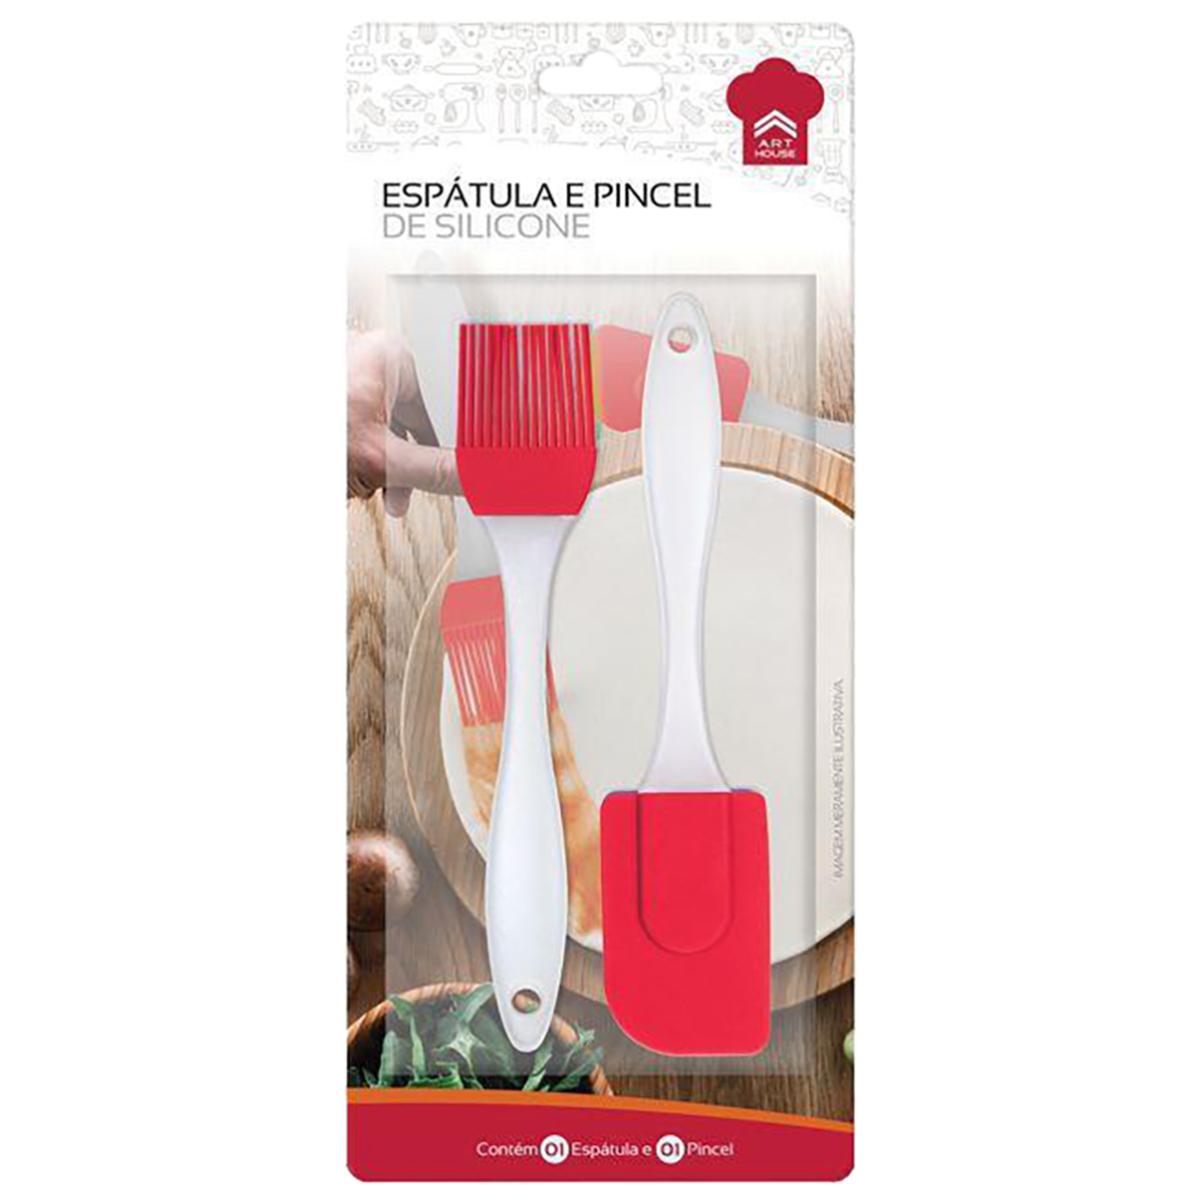 Kit Espátula e Pincel Silicone Candy 20cm Vermelho Art House